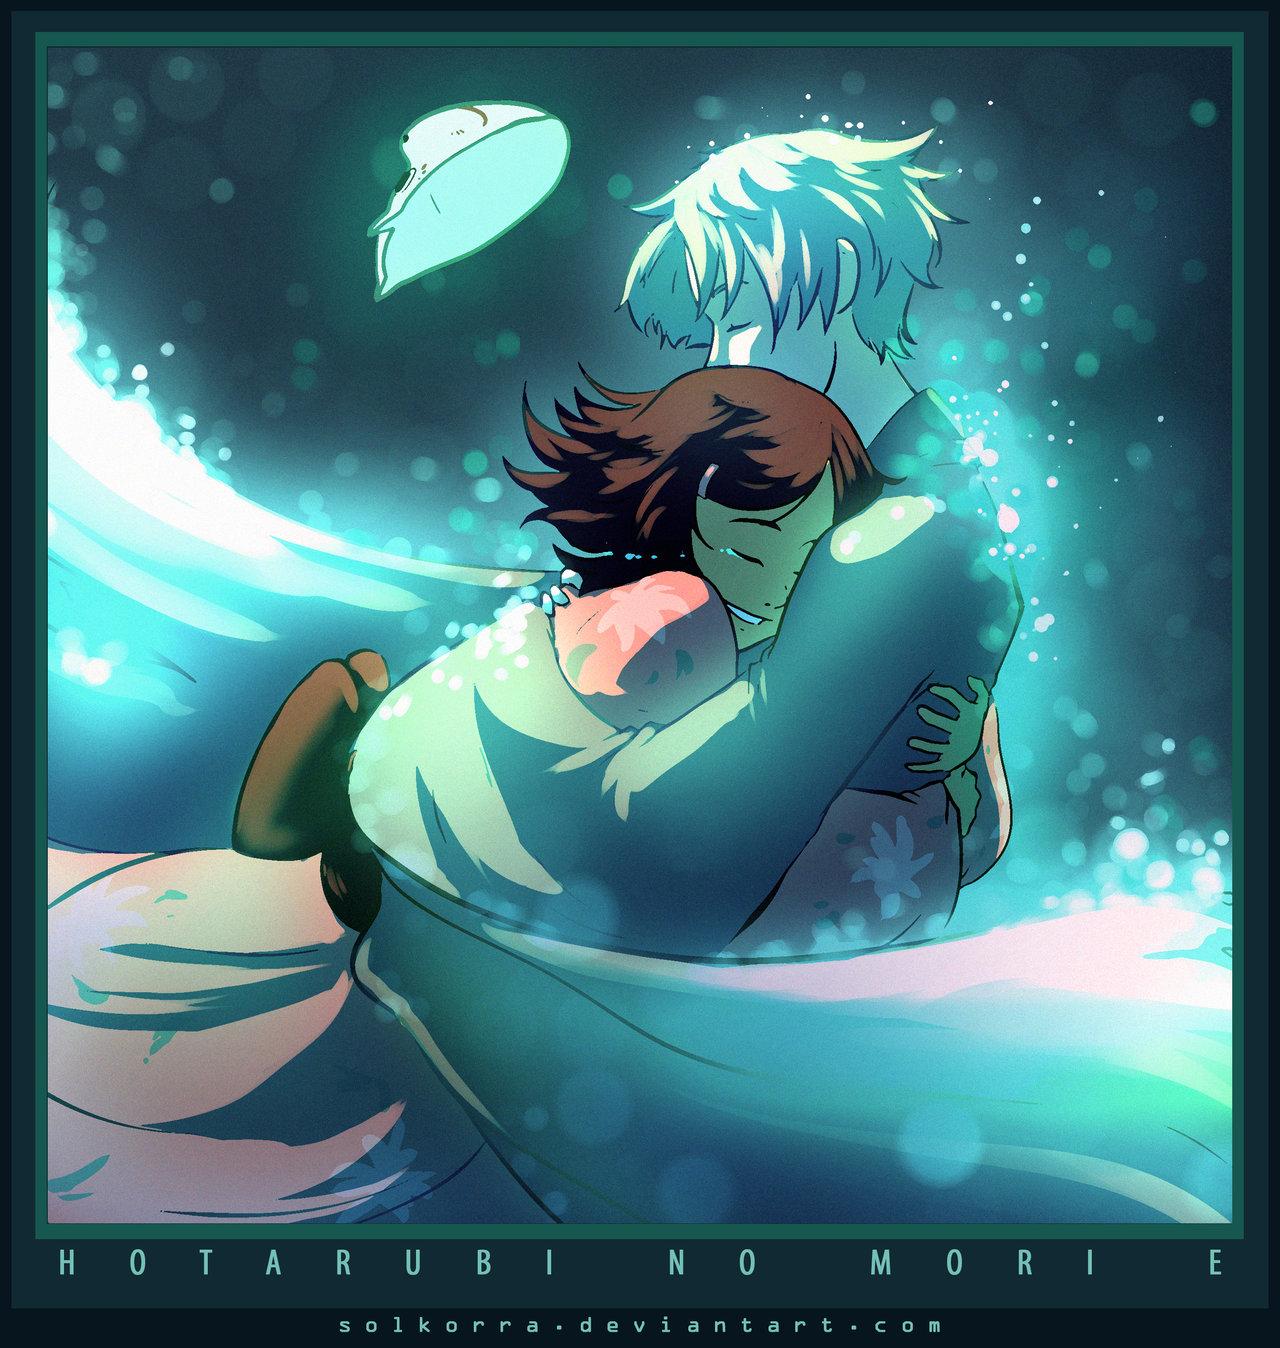 Free Download 054 Hotarubi No Mori E By Solkorra 1280x1348 For